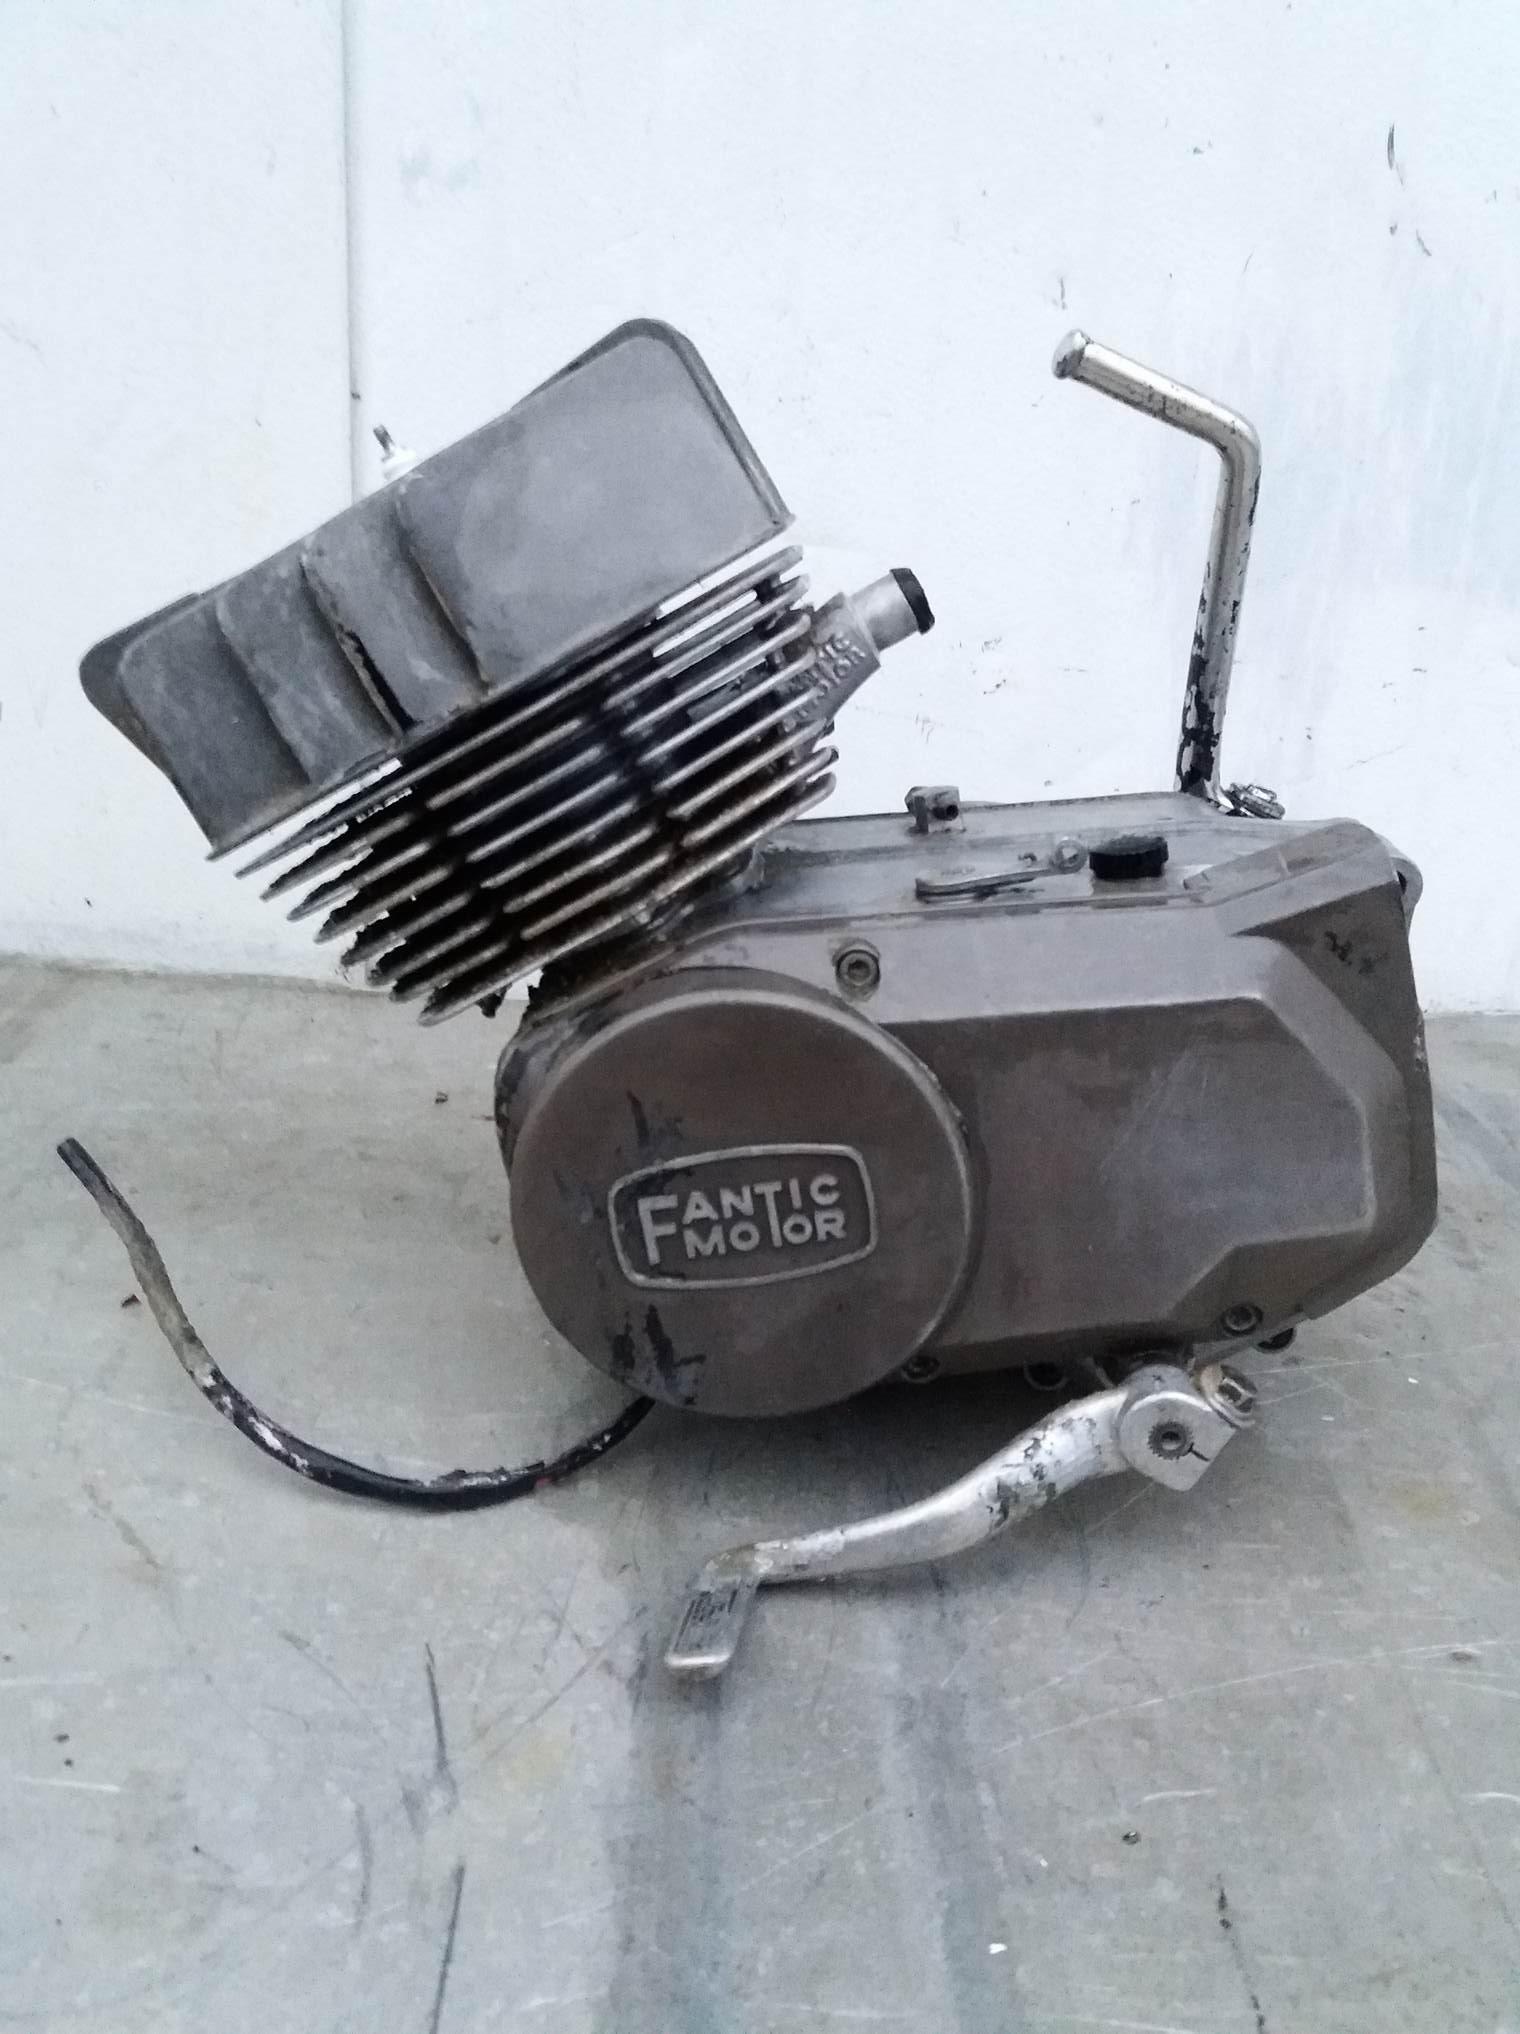 Blocco motore fantic 50 4v